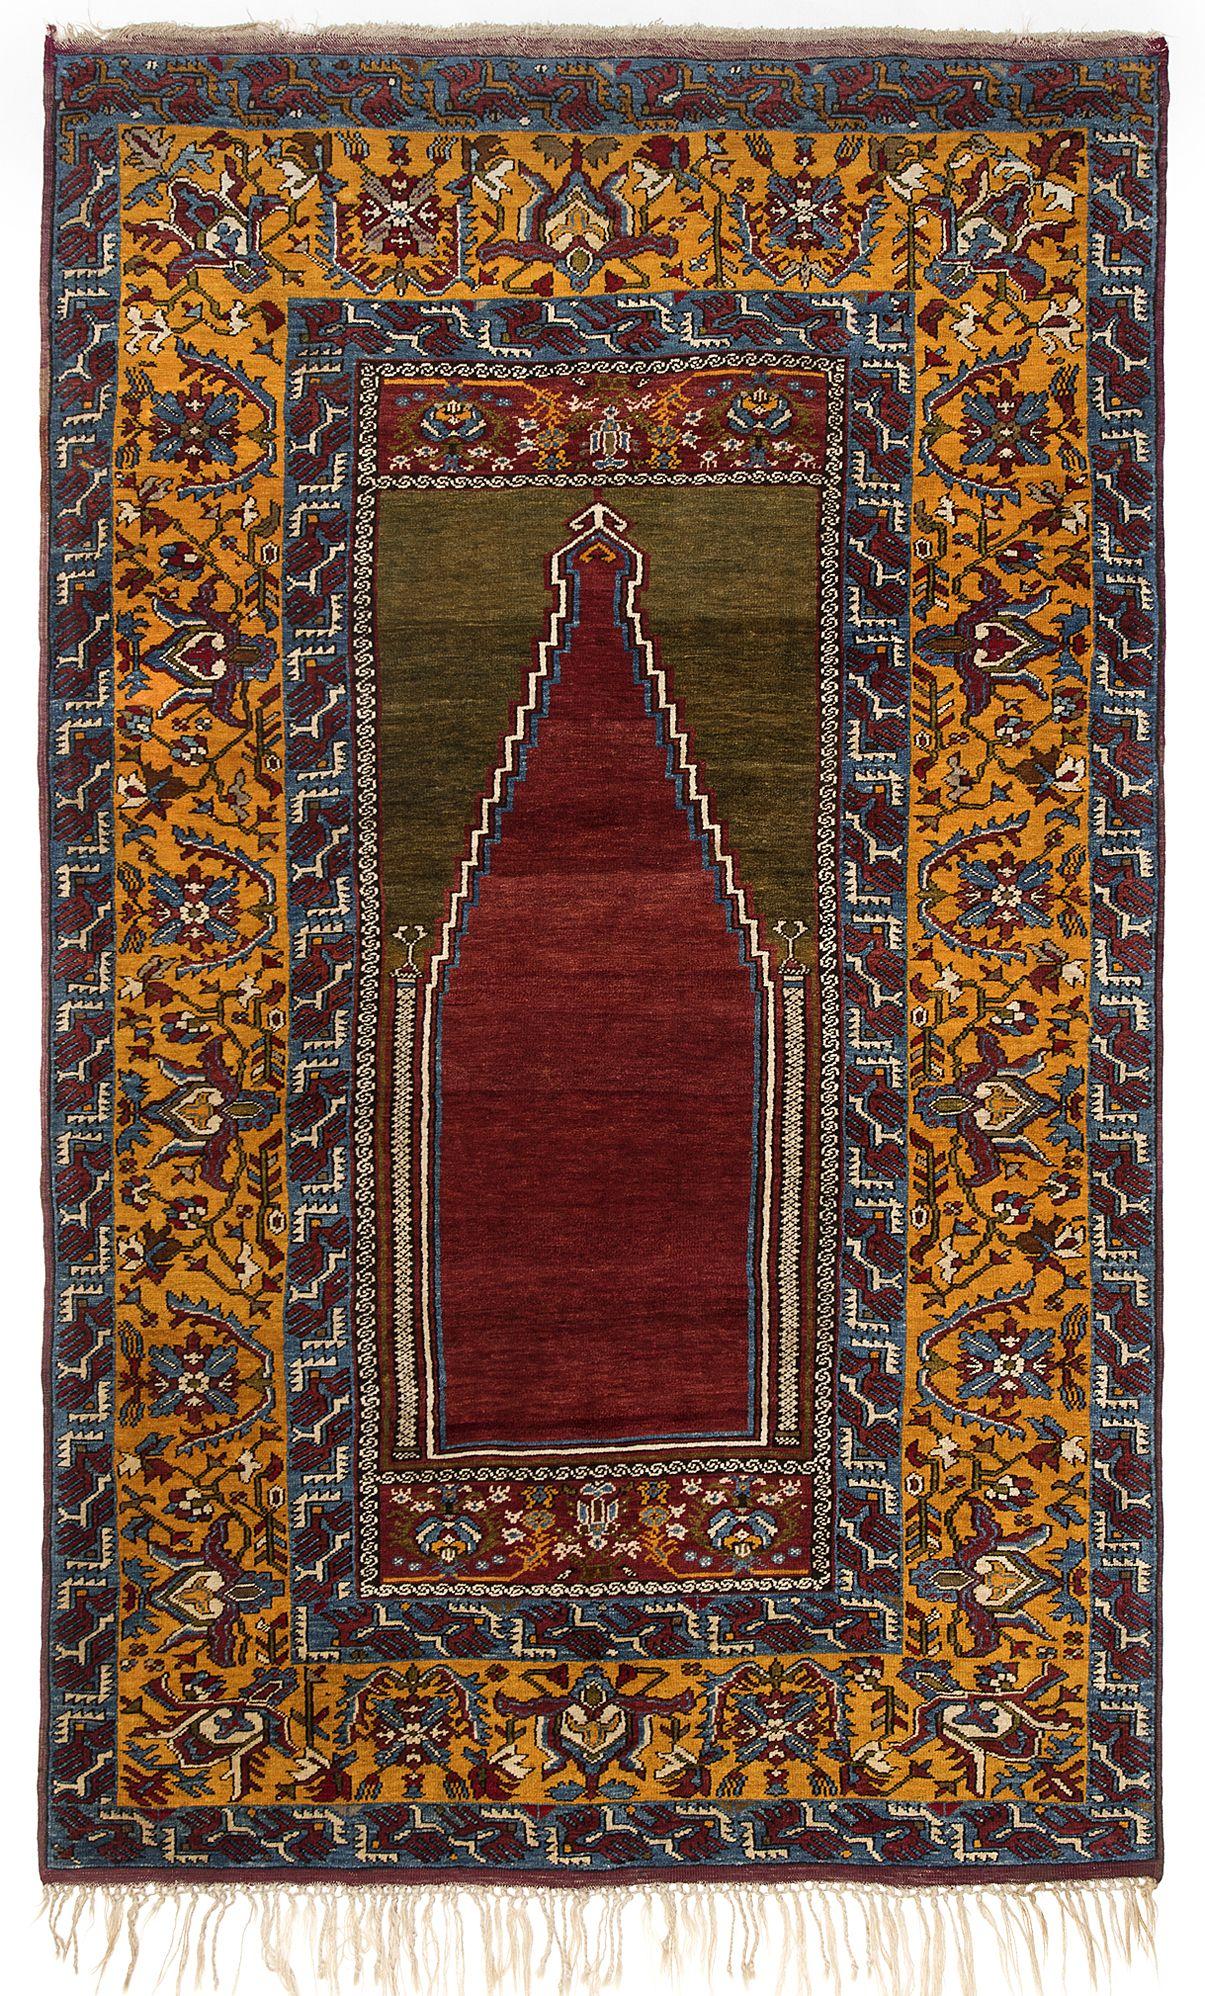 Pin di Elahe Moslemi su Carpet nel 2019 Tappeti